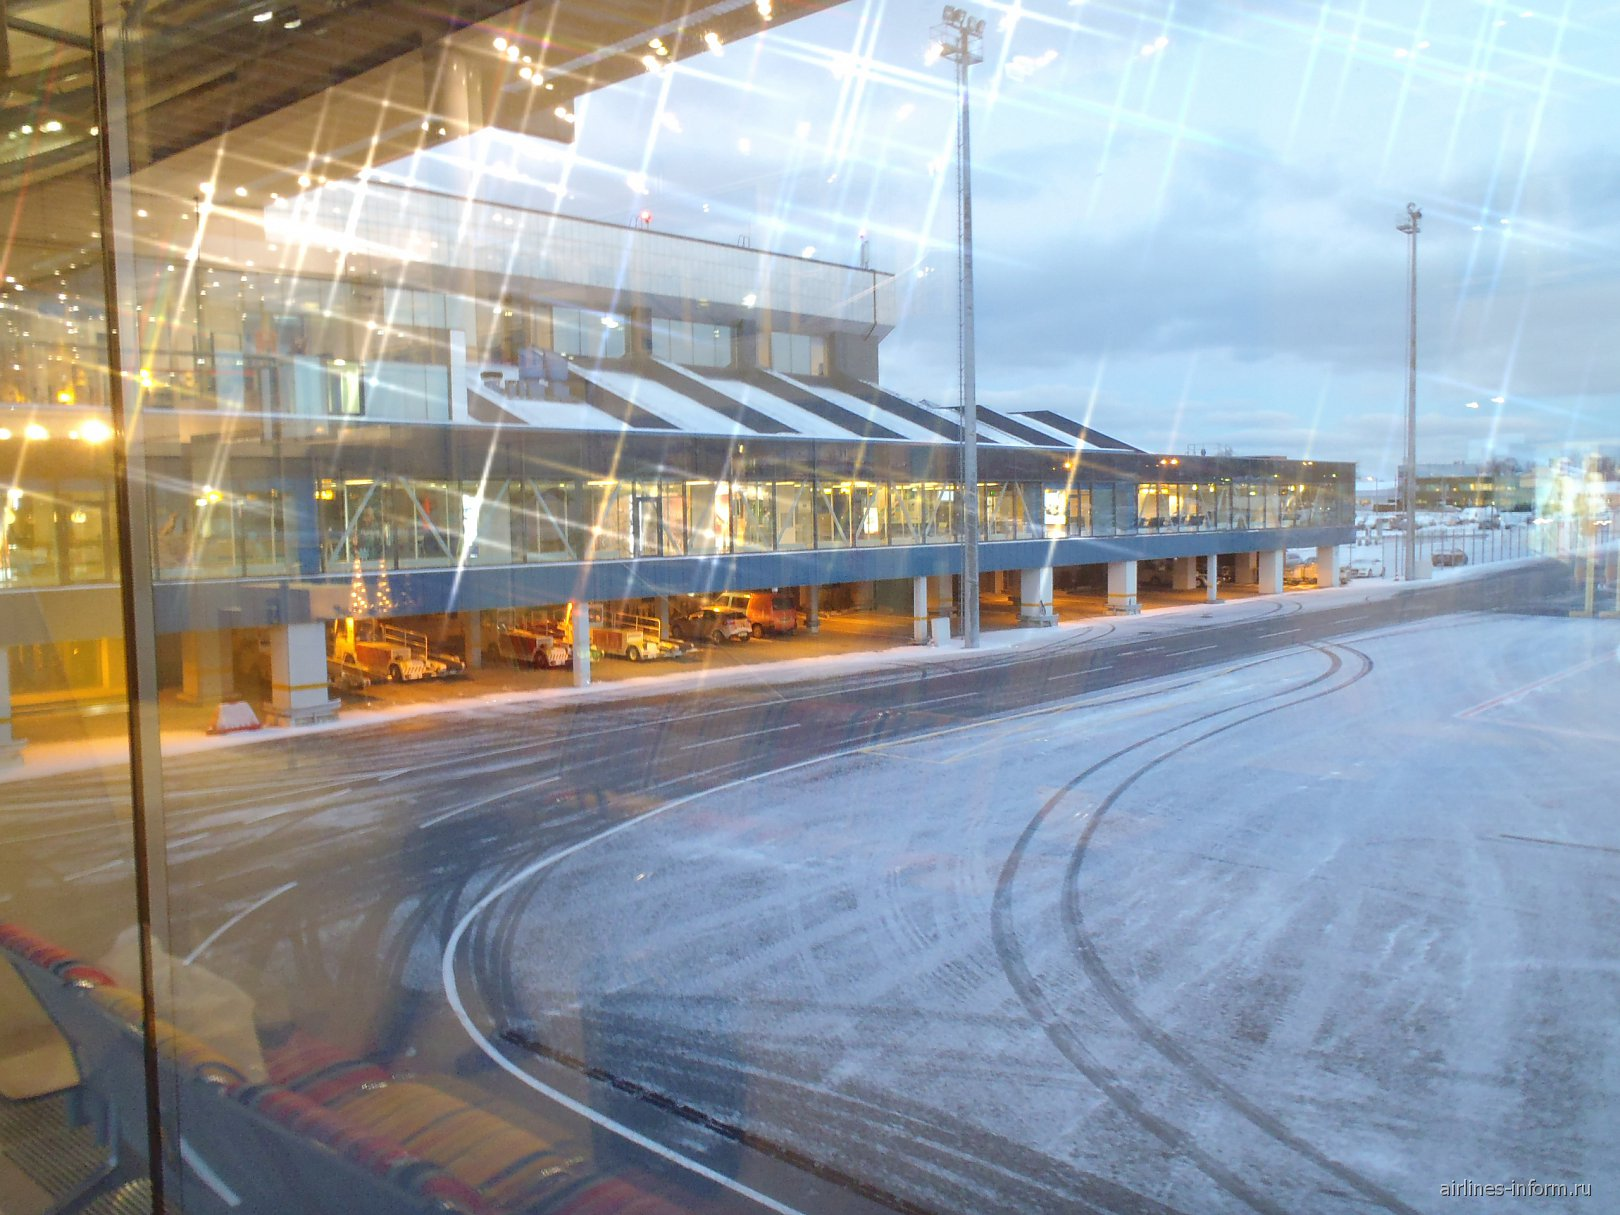 Пассажирский терминал аэропорта Таллин